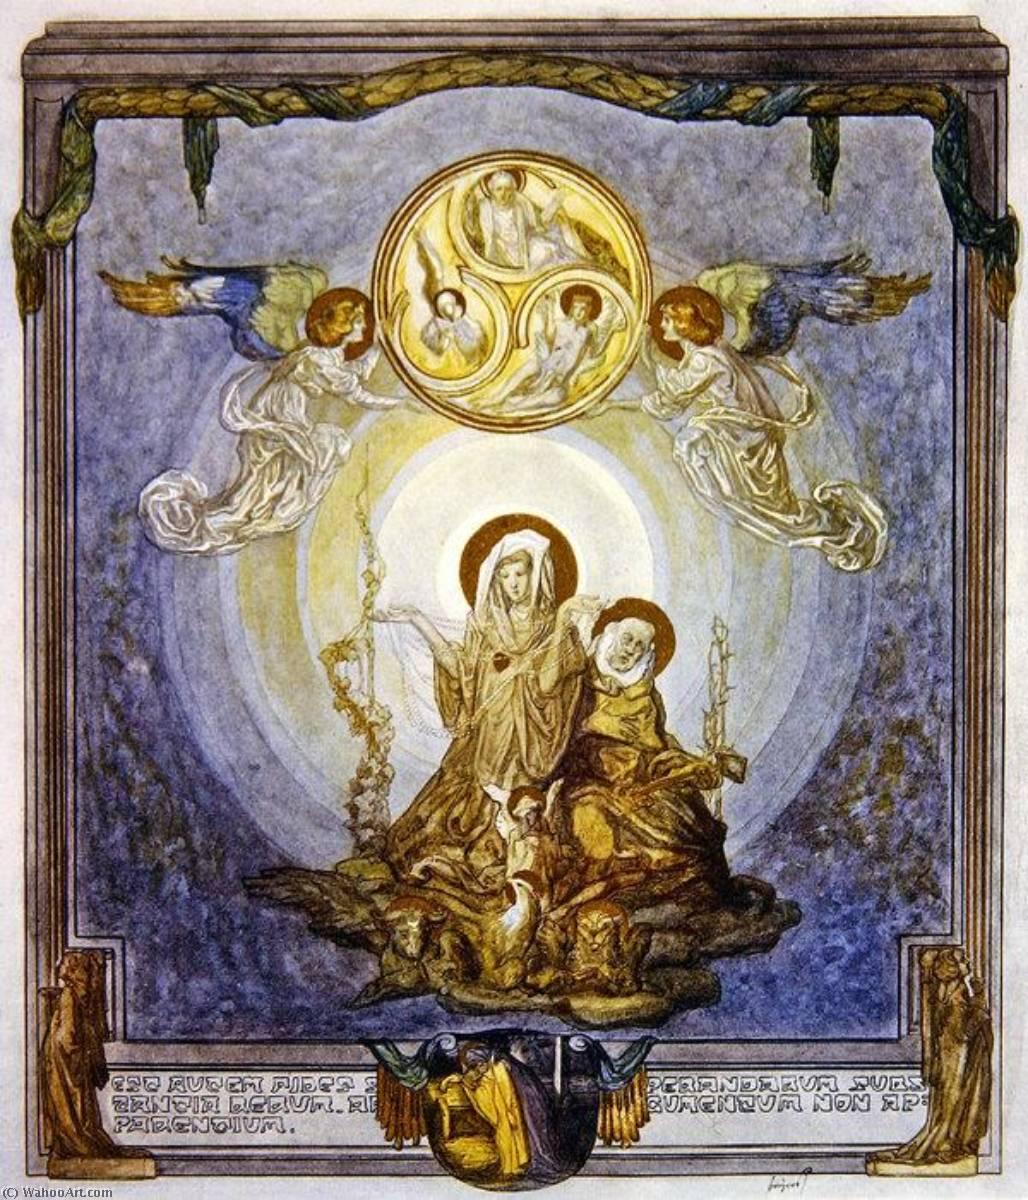 WikiOO.org – 美術百科全書 - 繪畫,作品 Franz Von Bayros - 插图 从 Dante's 'Divine Comedy' , 天堂 , 颂歌 二十四